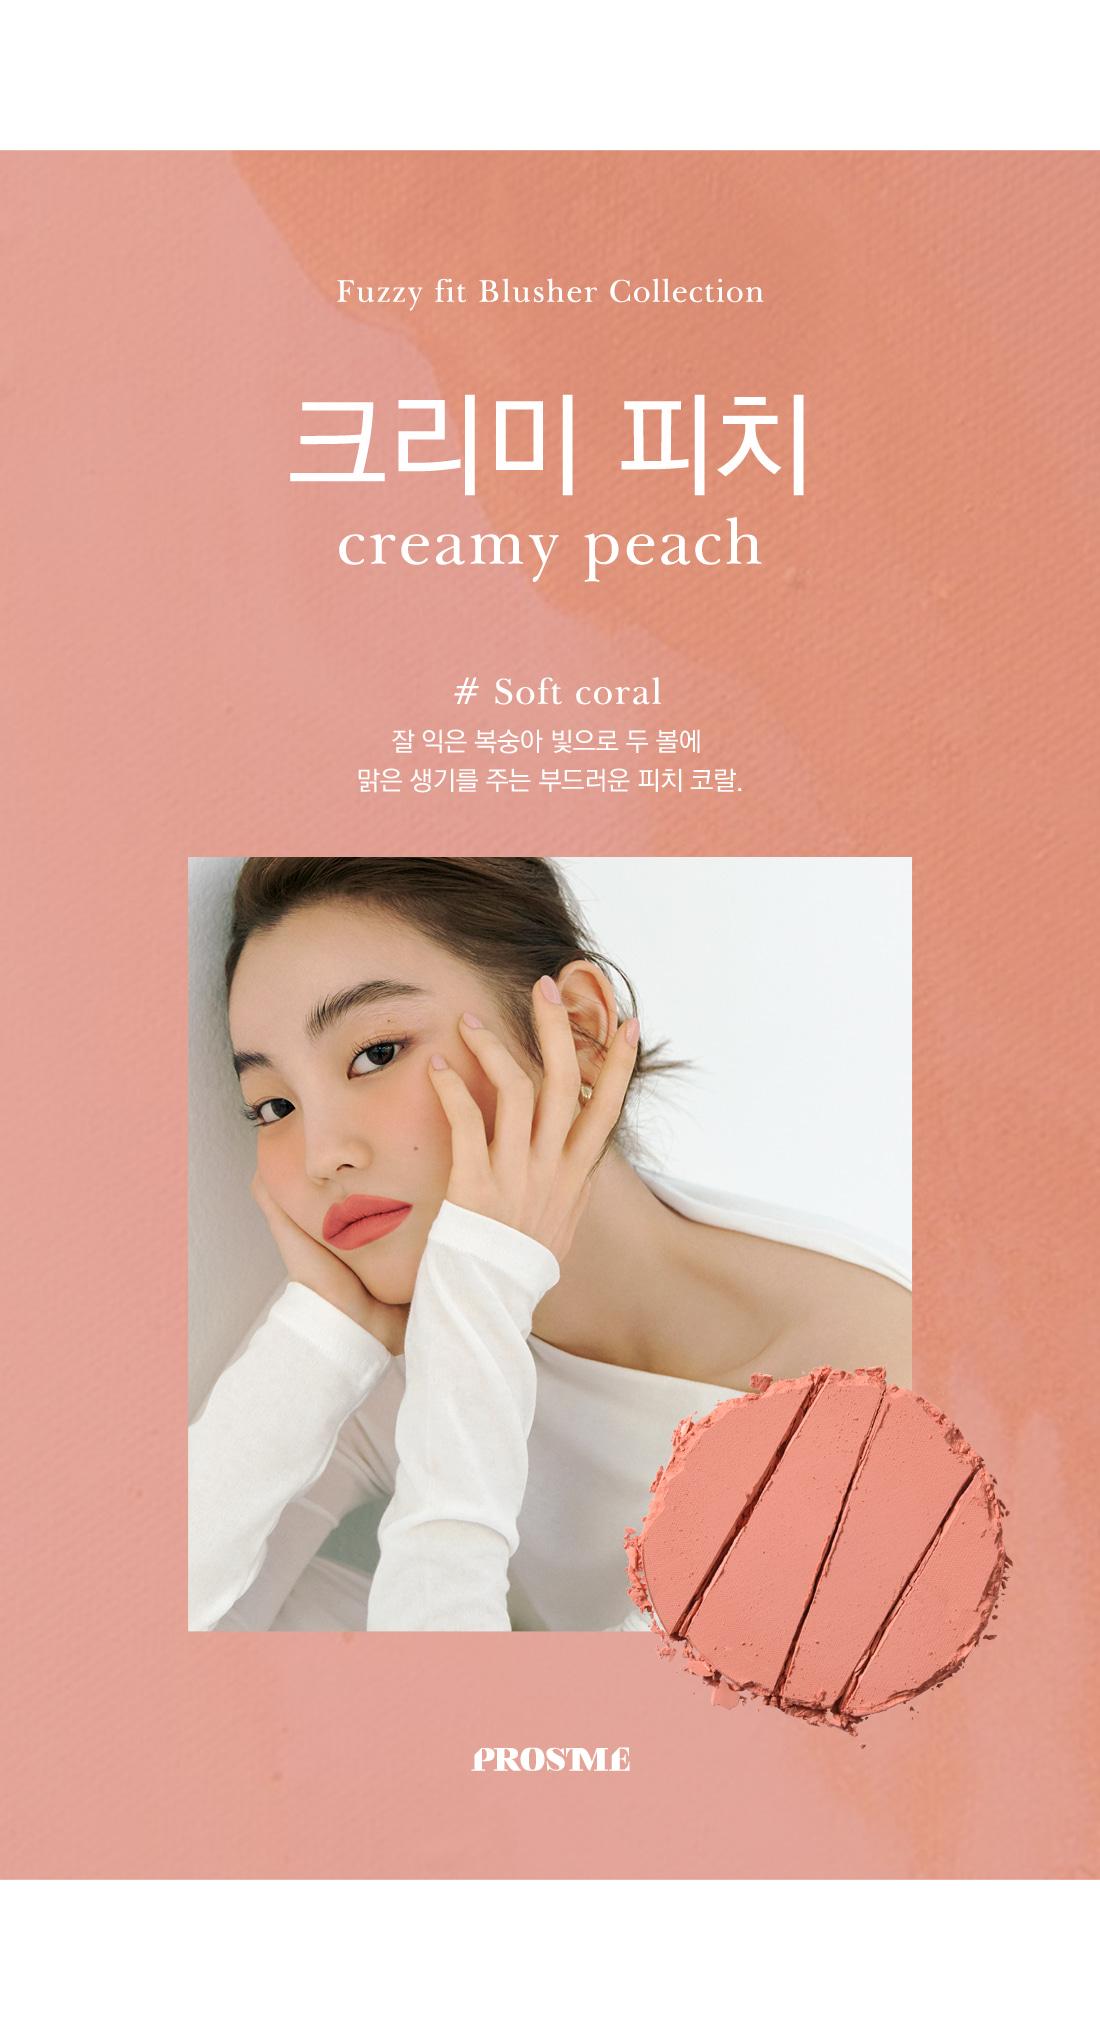 sale) 002 Fuzzy Fit Blusher Creamy Peach